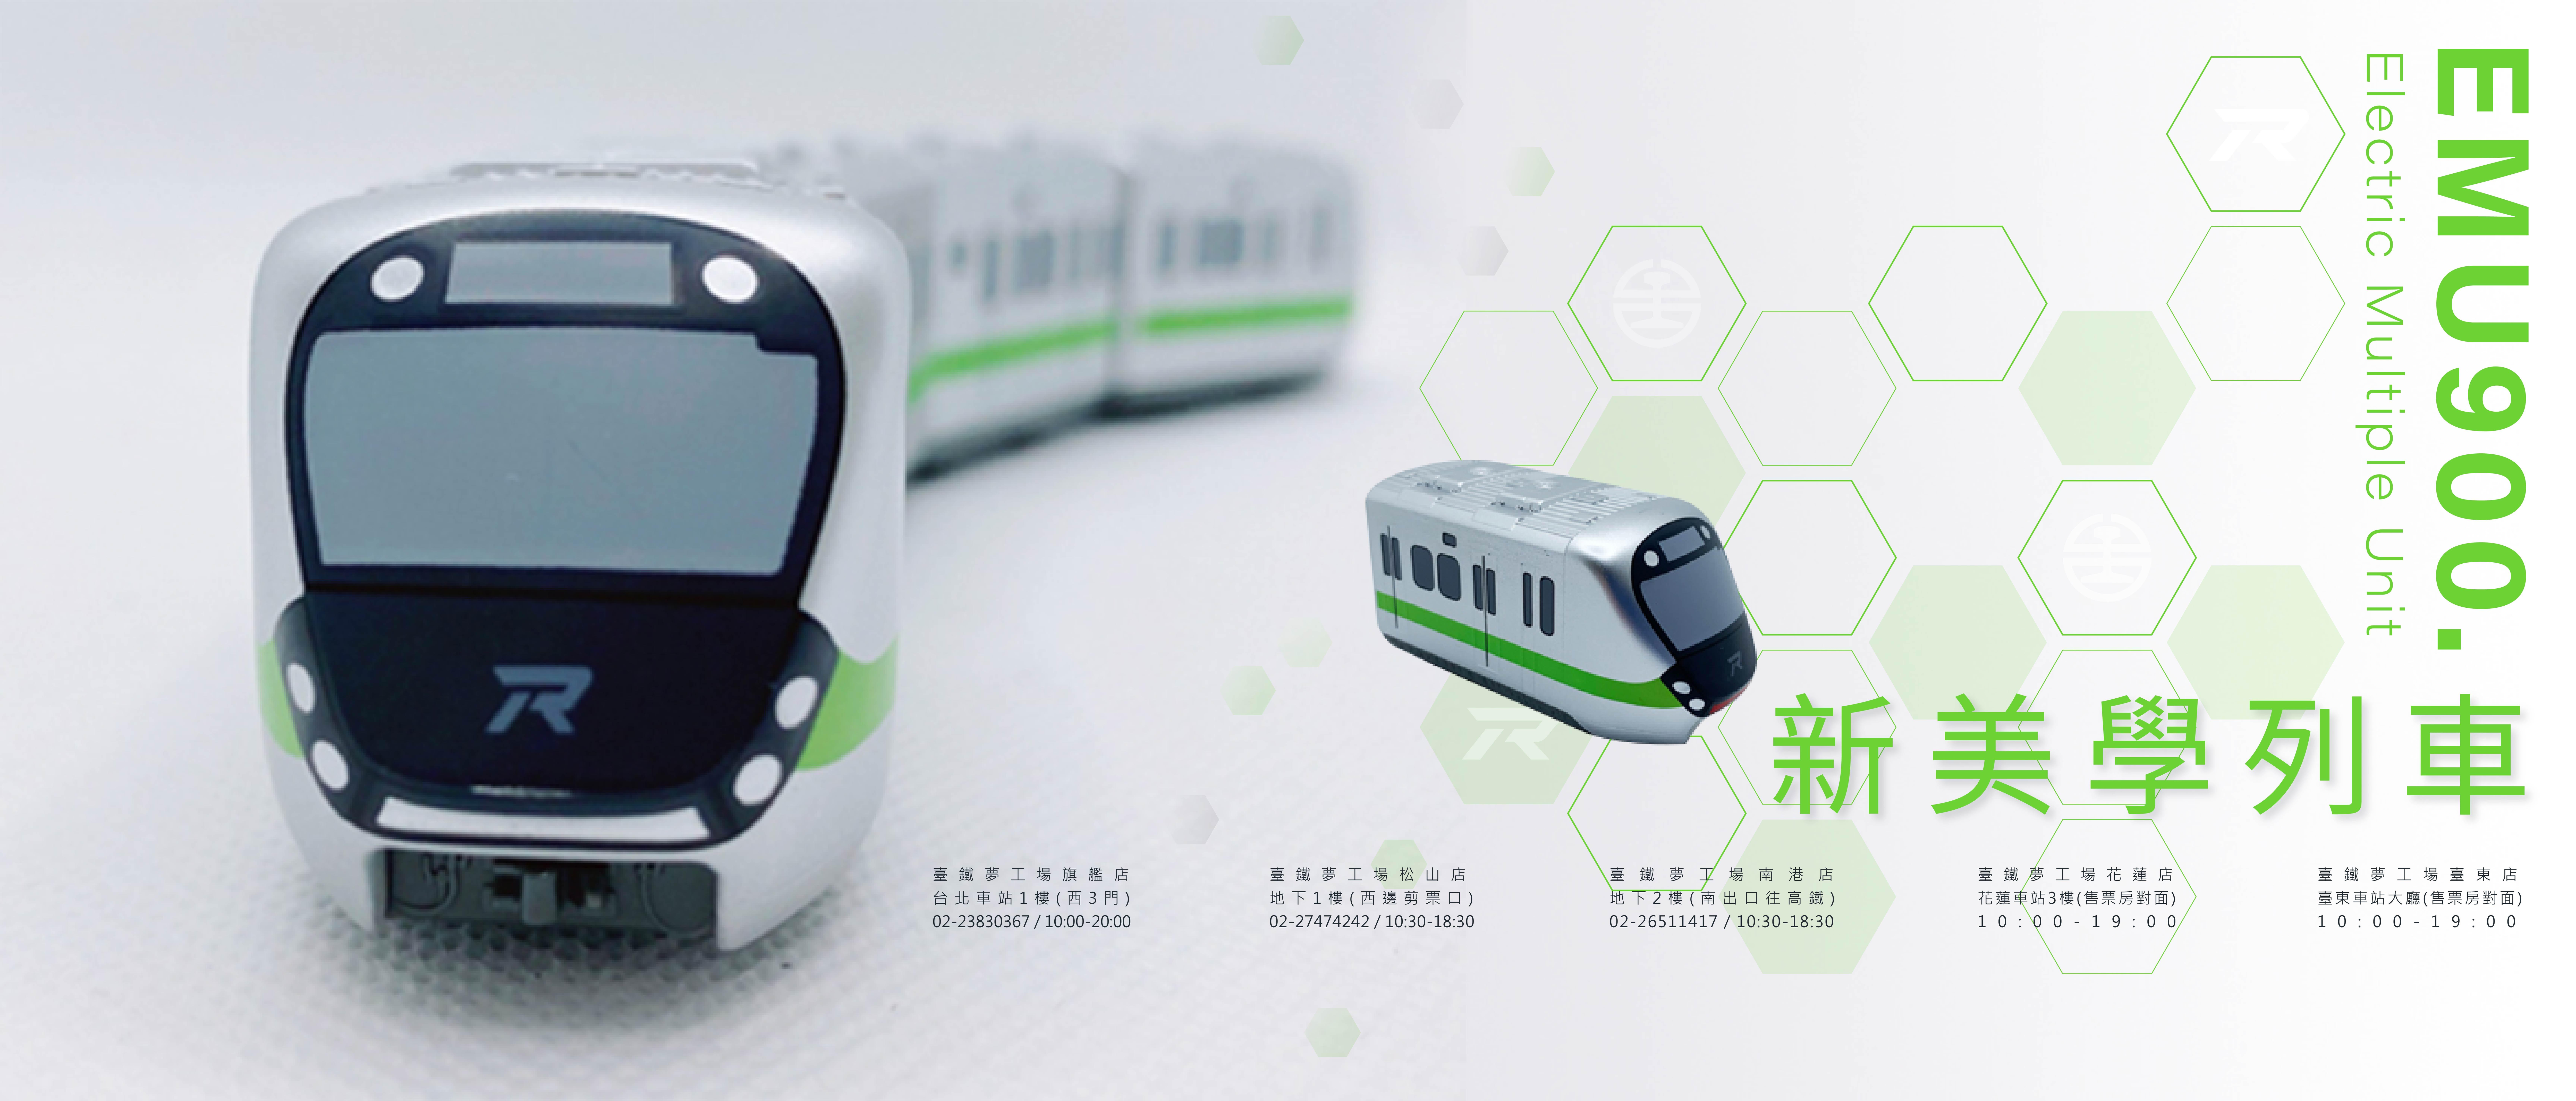 EMU900美學迴力列車開賣囉!